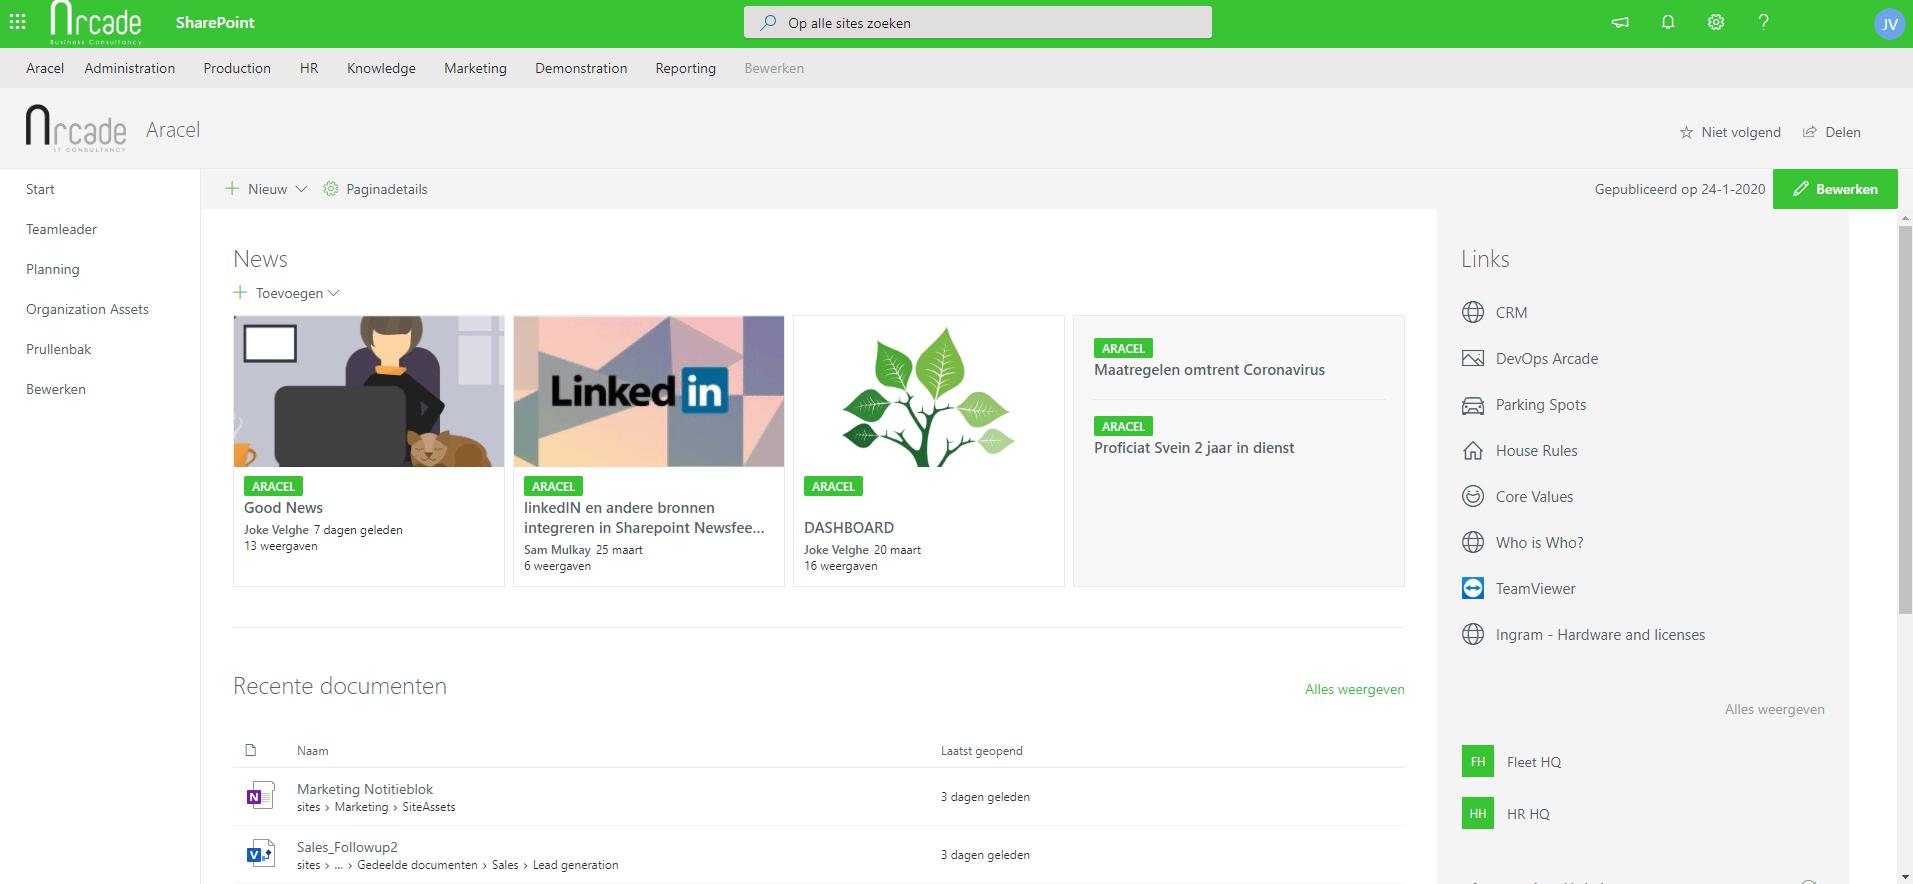 Mirosoft Sharepoint to share documents